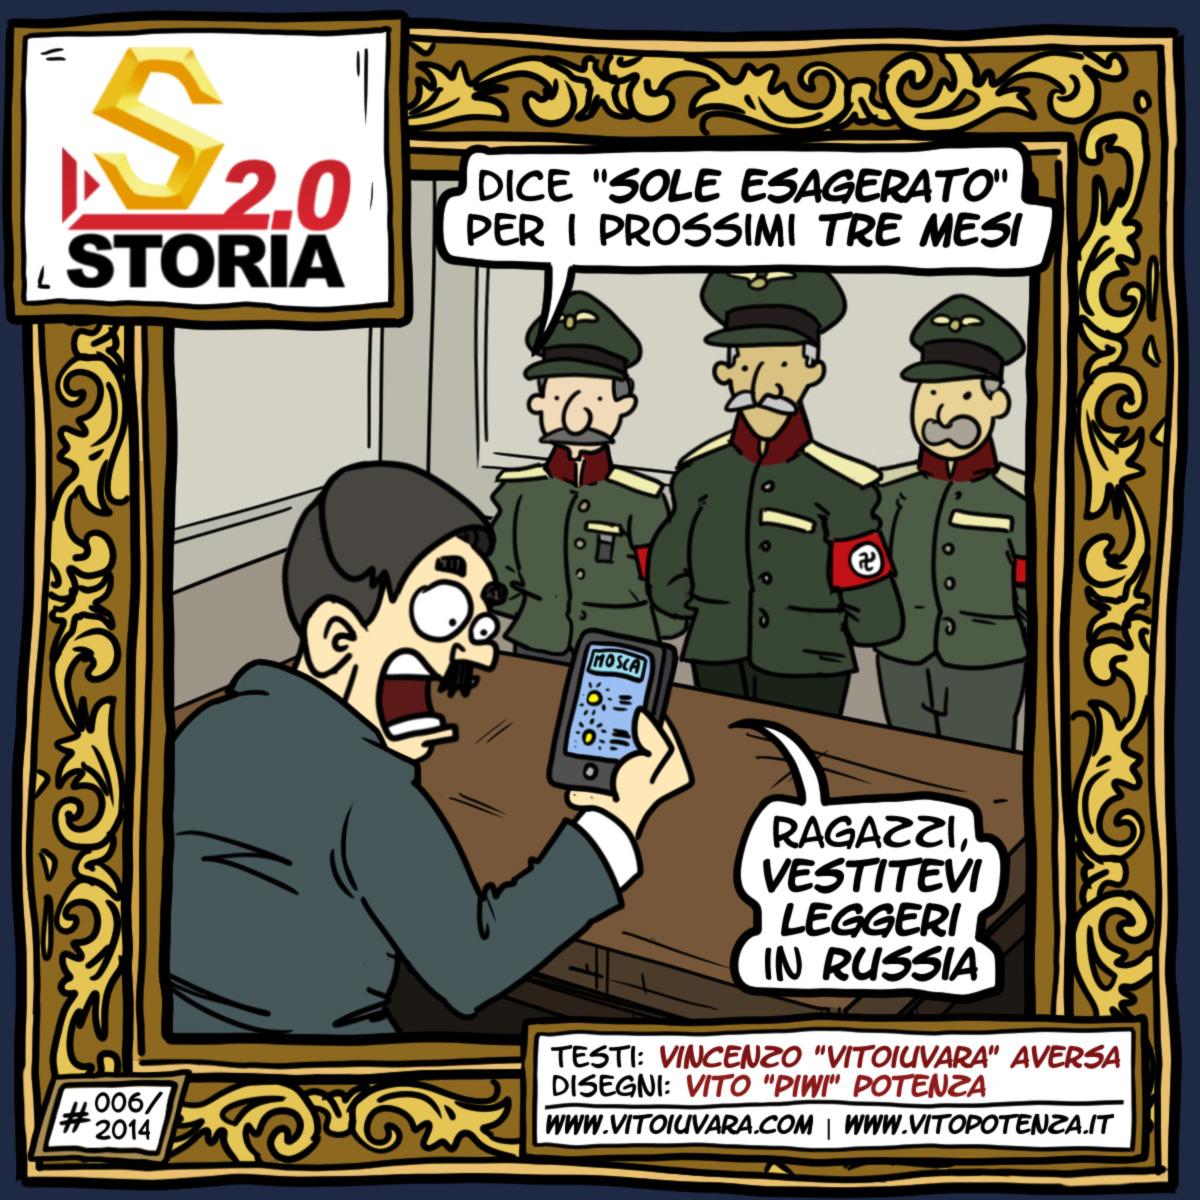 Storia 2.0: Vignette 06-10